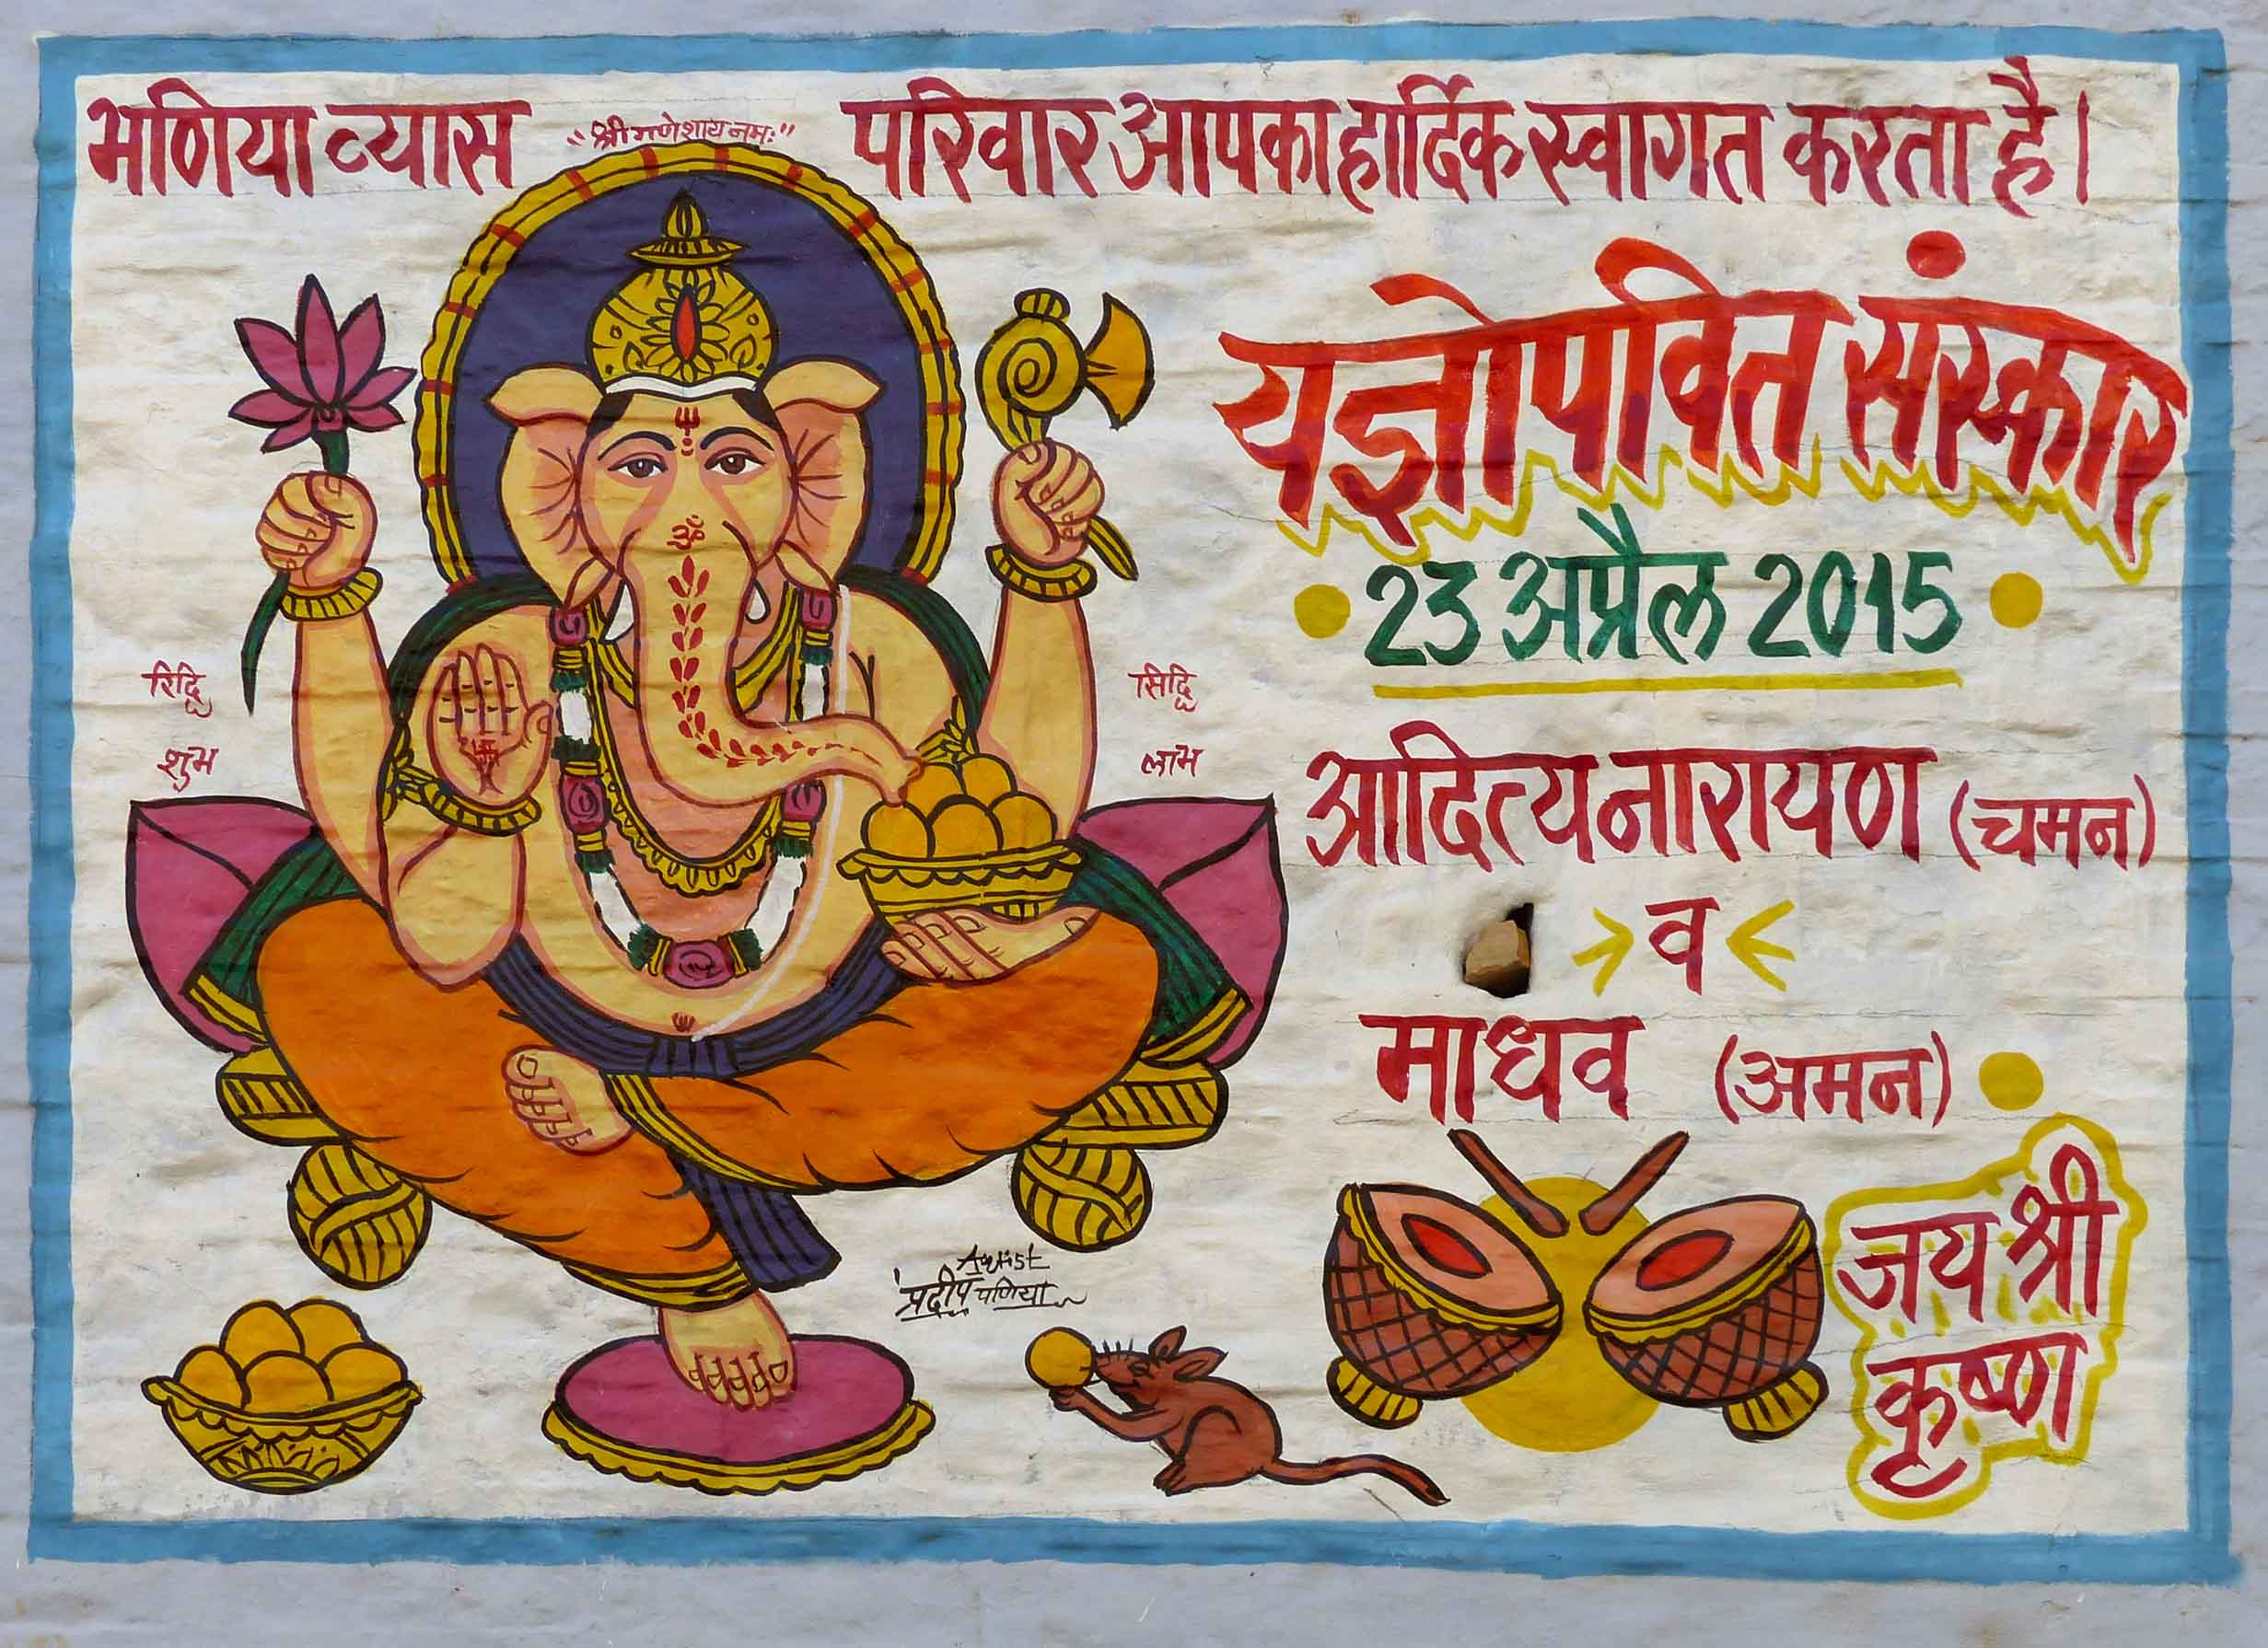 Painting of elephant headed god and Hindu writing